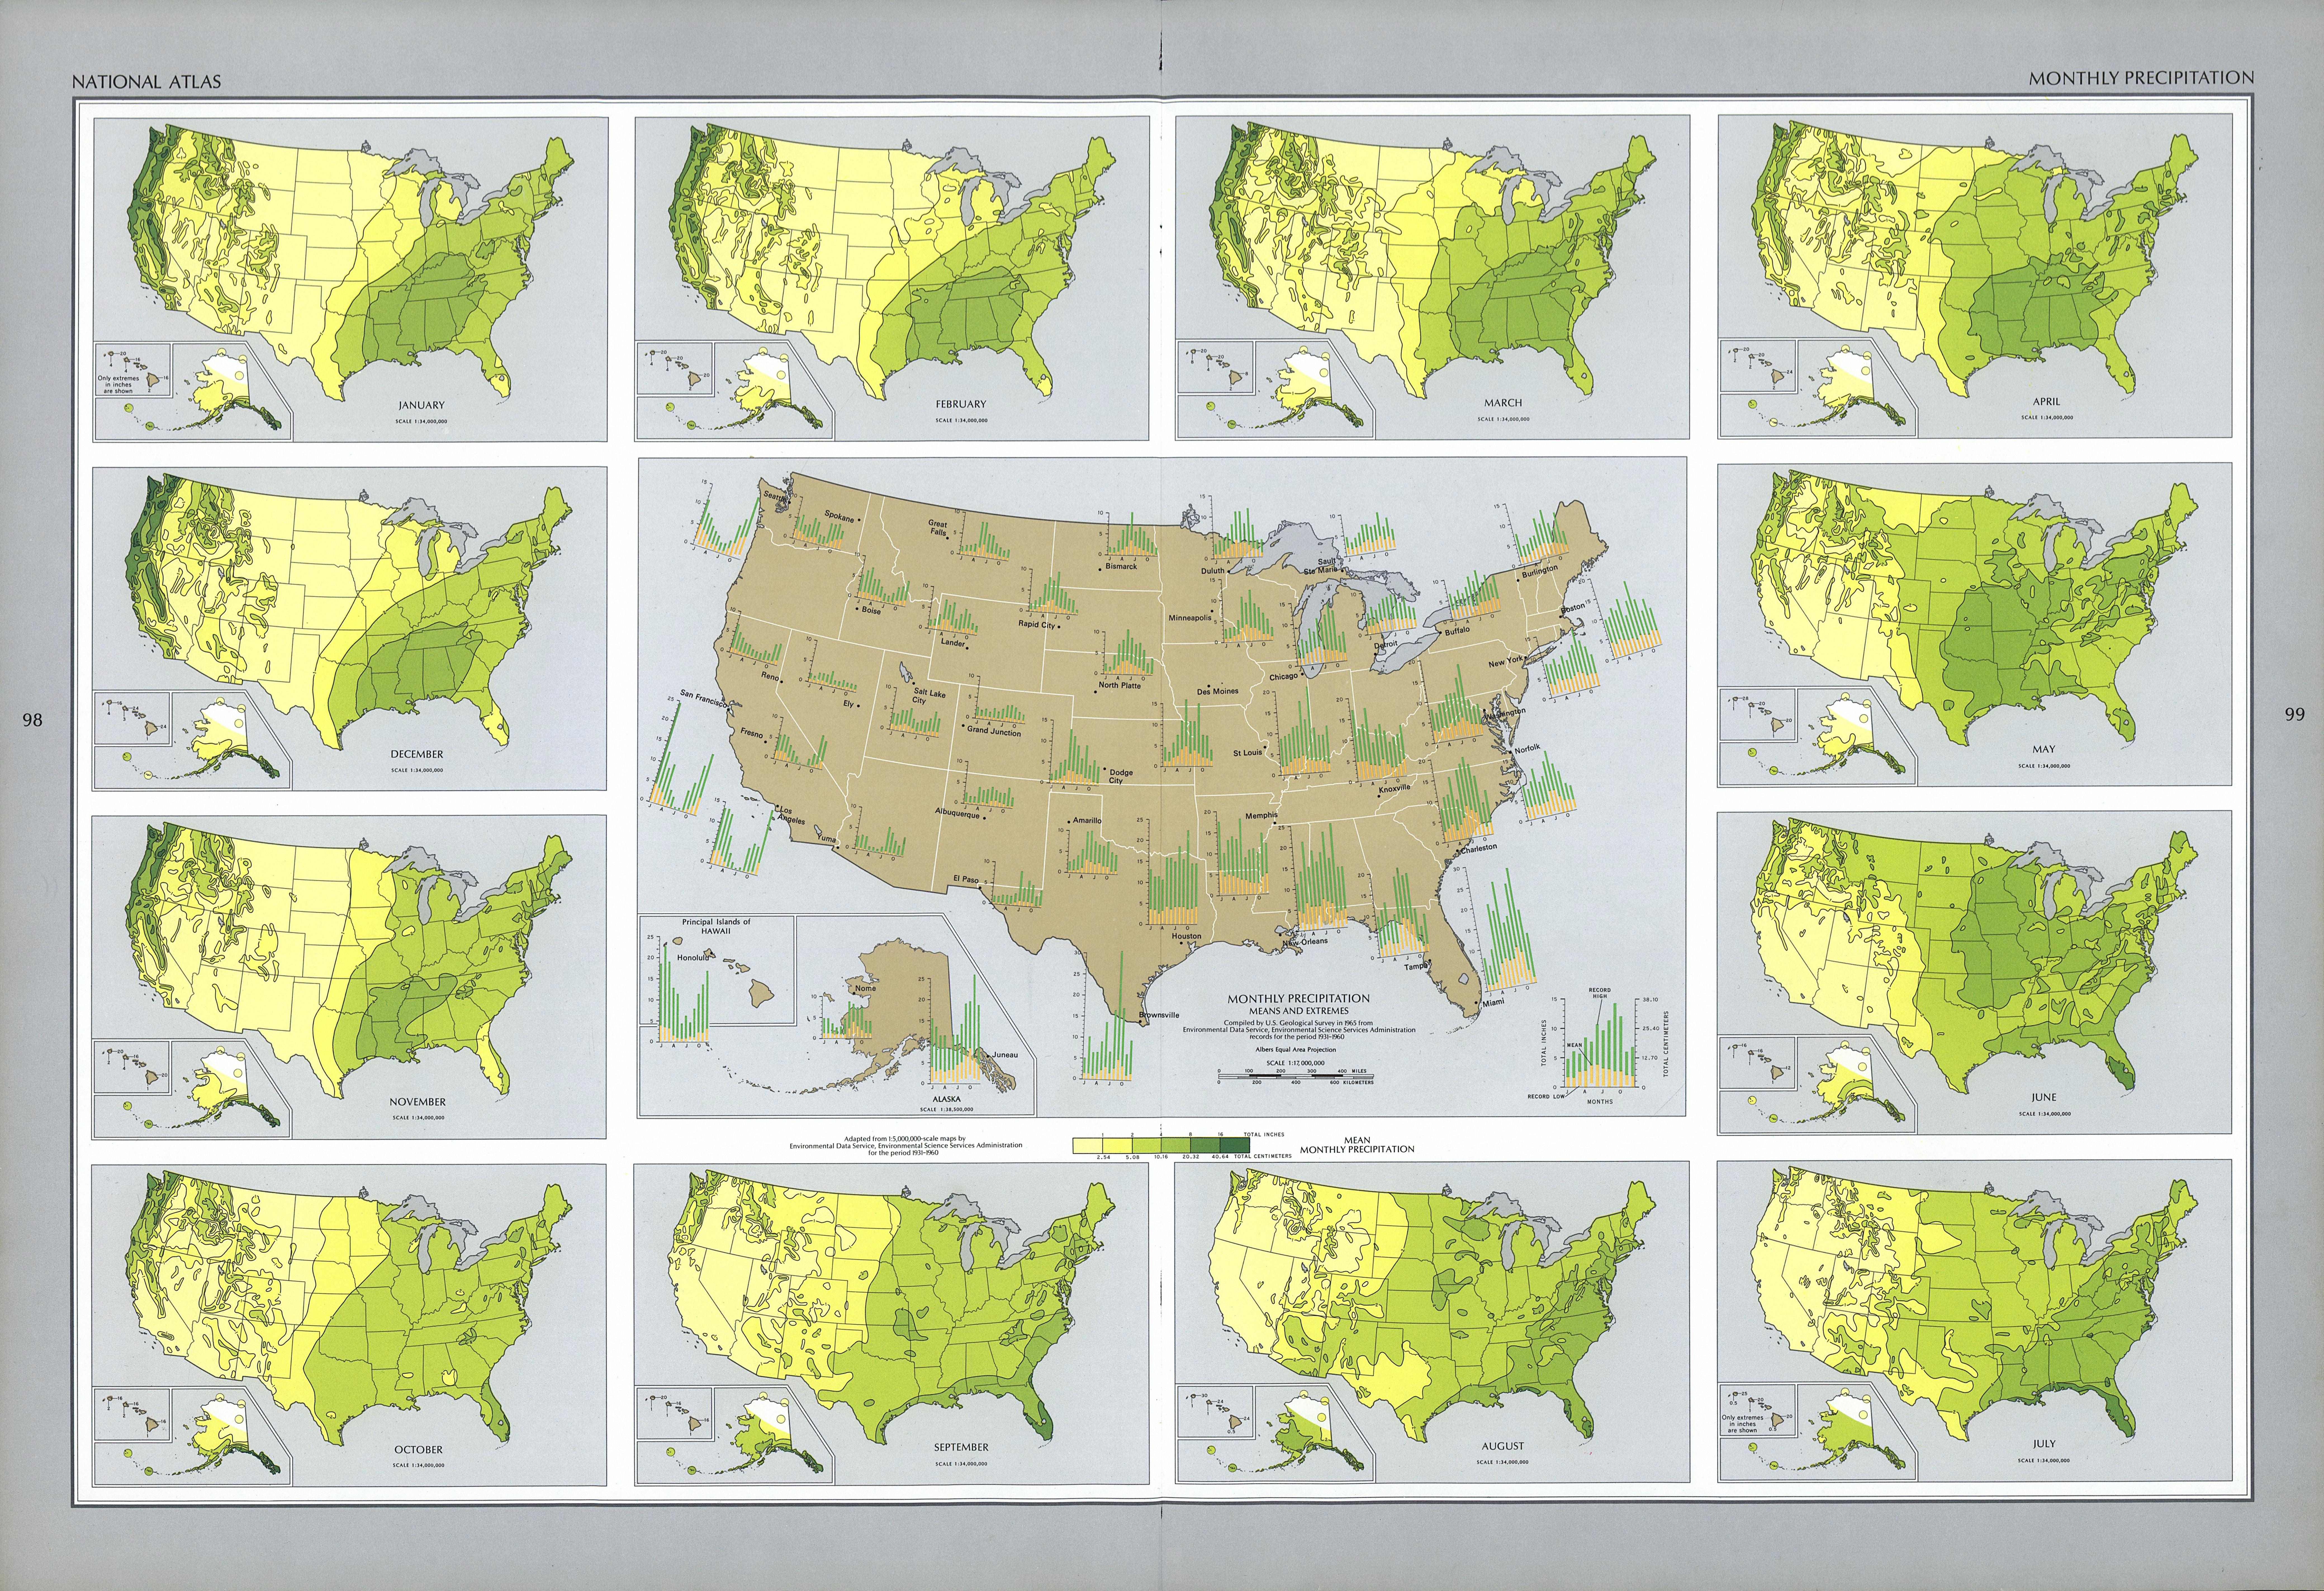 Maps of United States Monthly Precipitation Map - mapa.owje.com